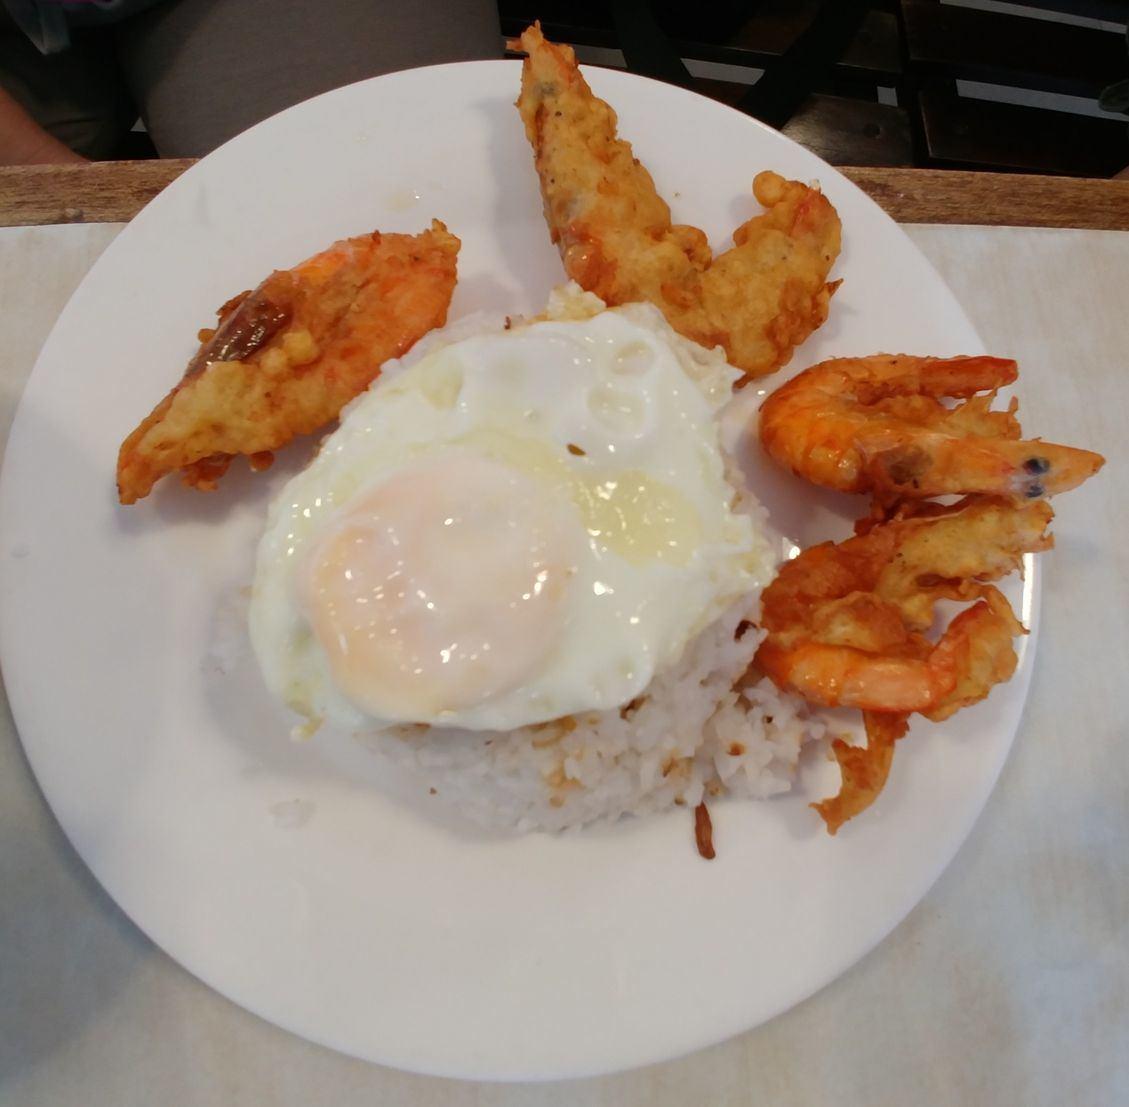 Crispy hipon or shrimp, sinangag, and itlog or hipsilog